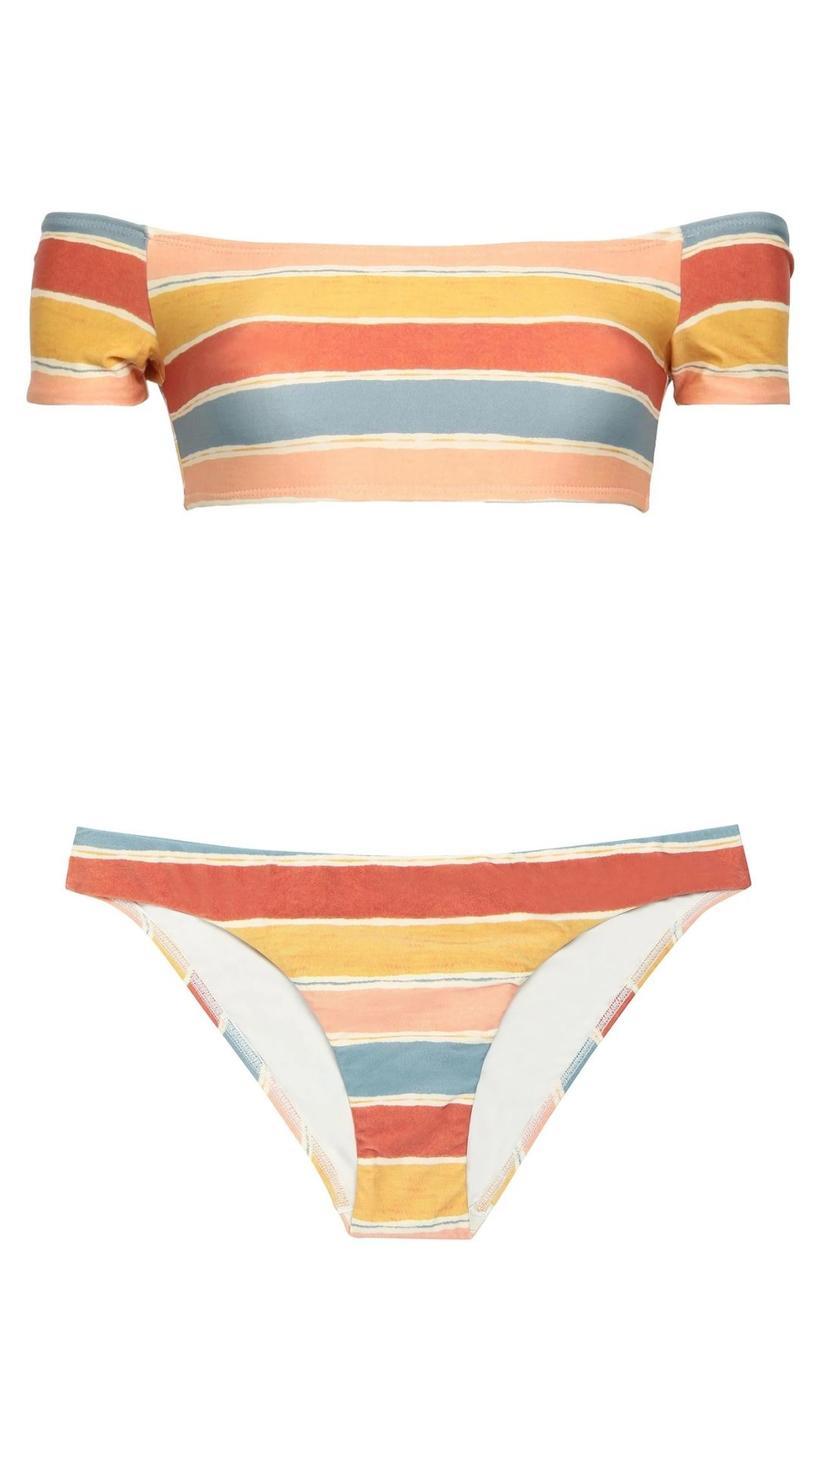 Swimwear, Beach Wear, Pool Wear, Summer wear, 2020, Summer 2020, Beach Mode, 2020 Bikinis